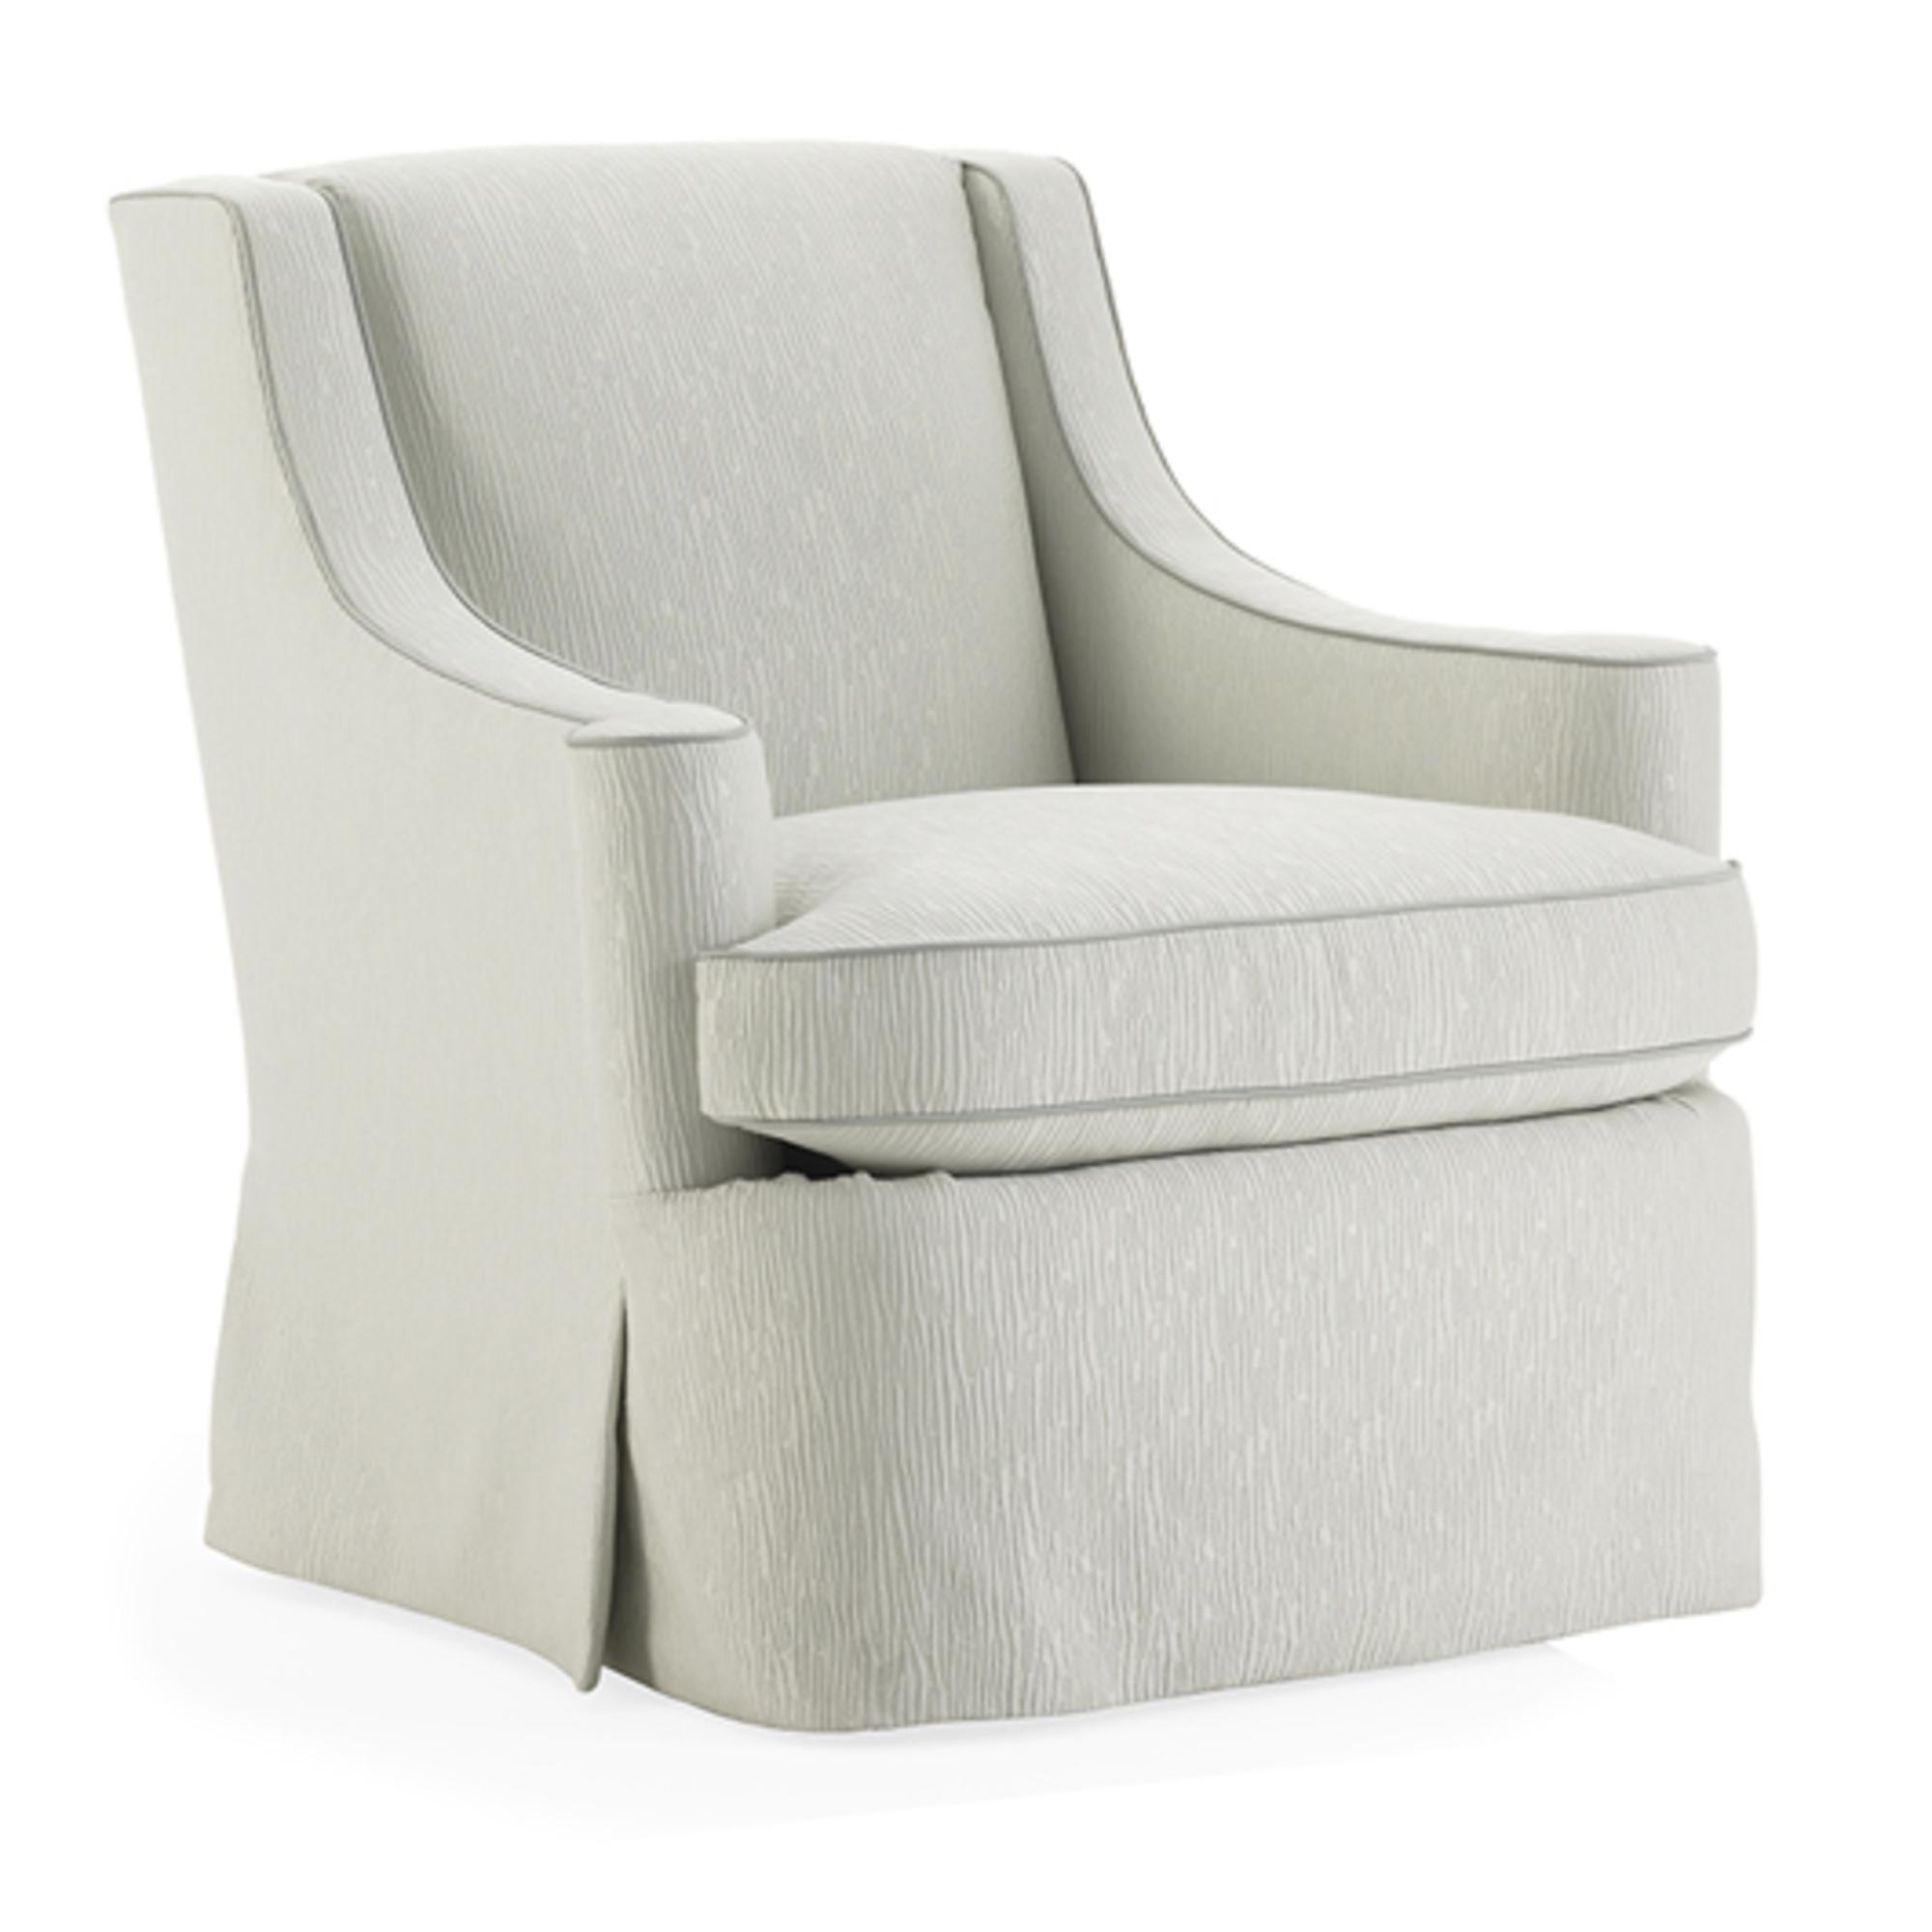 Attingham Swivel Lounge Chair